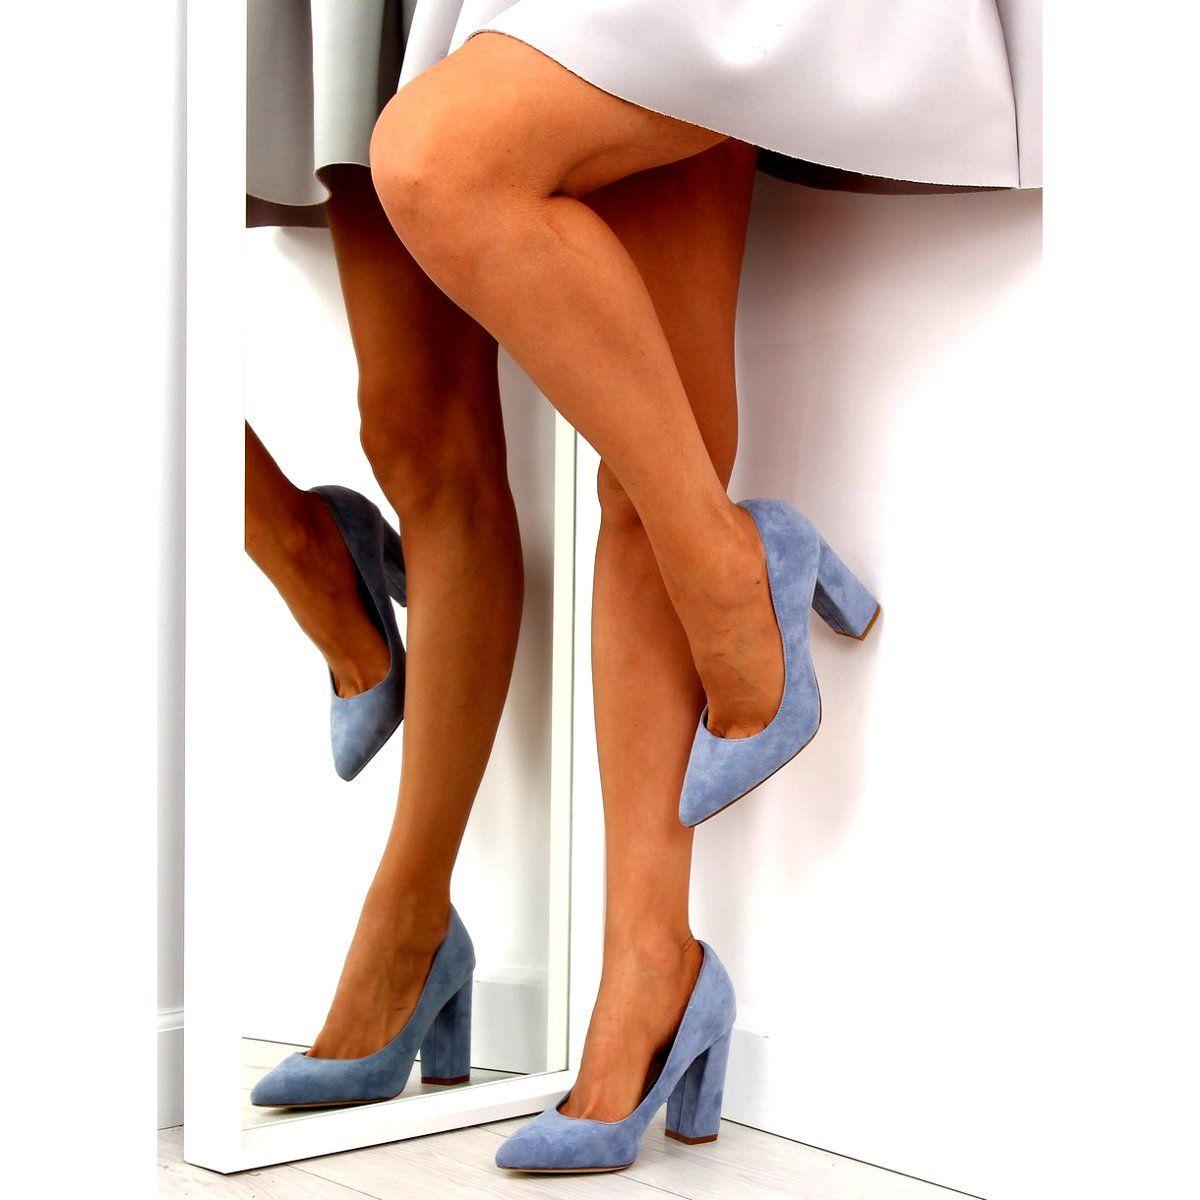 Czolenka Na Slupku Niebieskie R123p Blue Heels Pumps Shoes